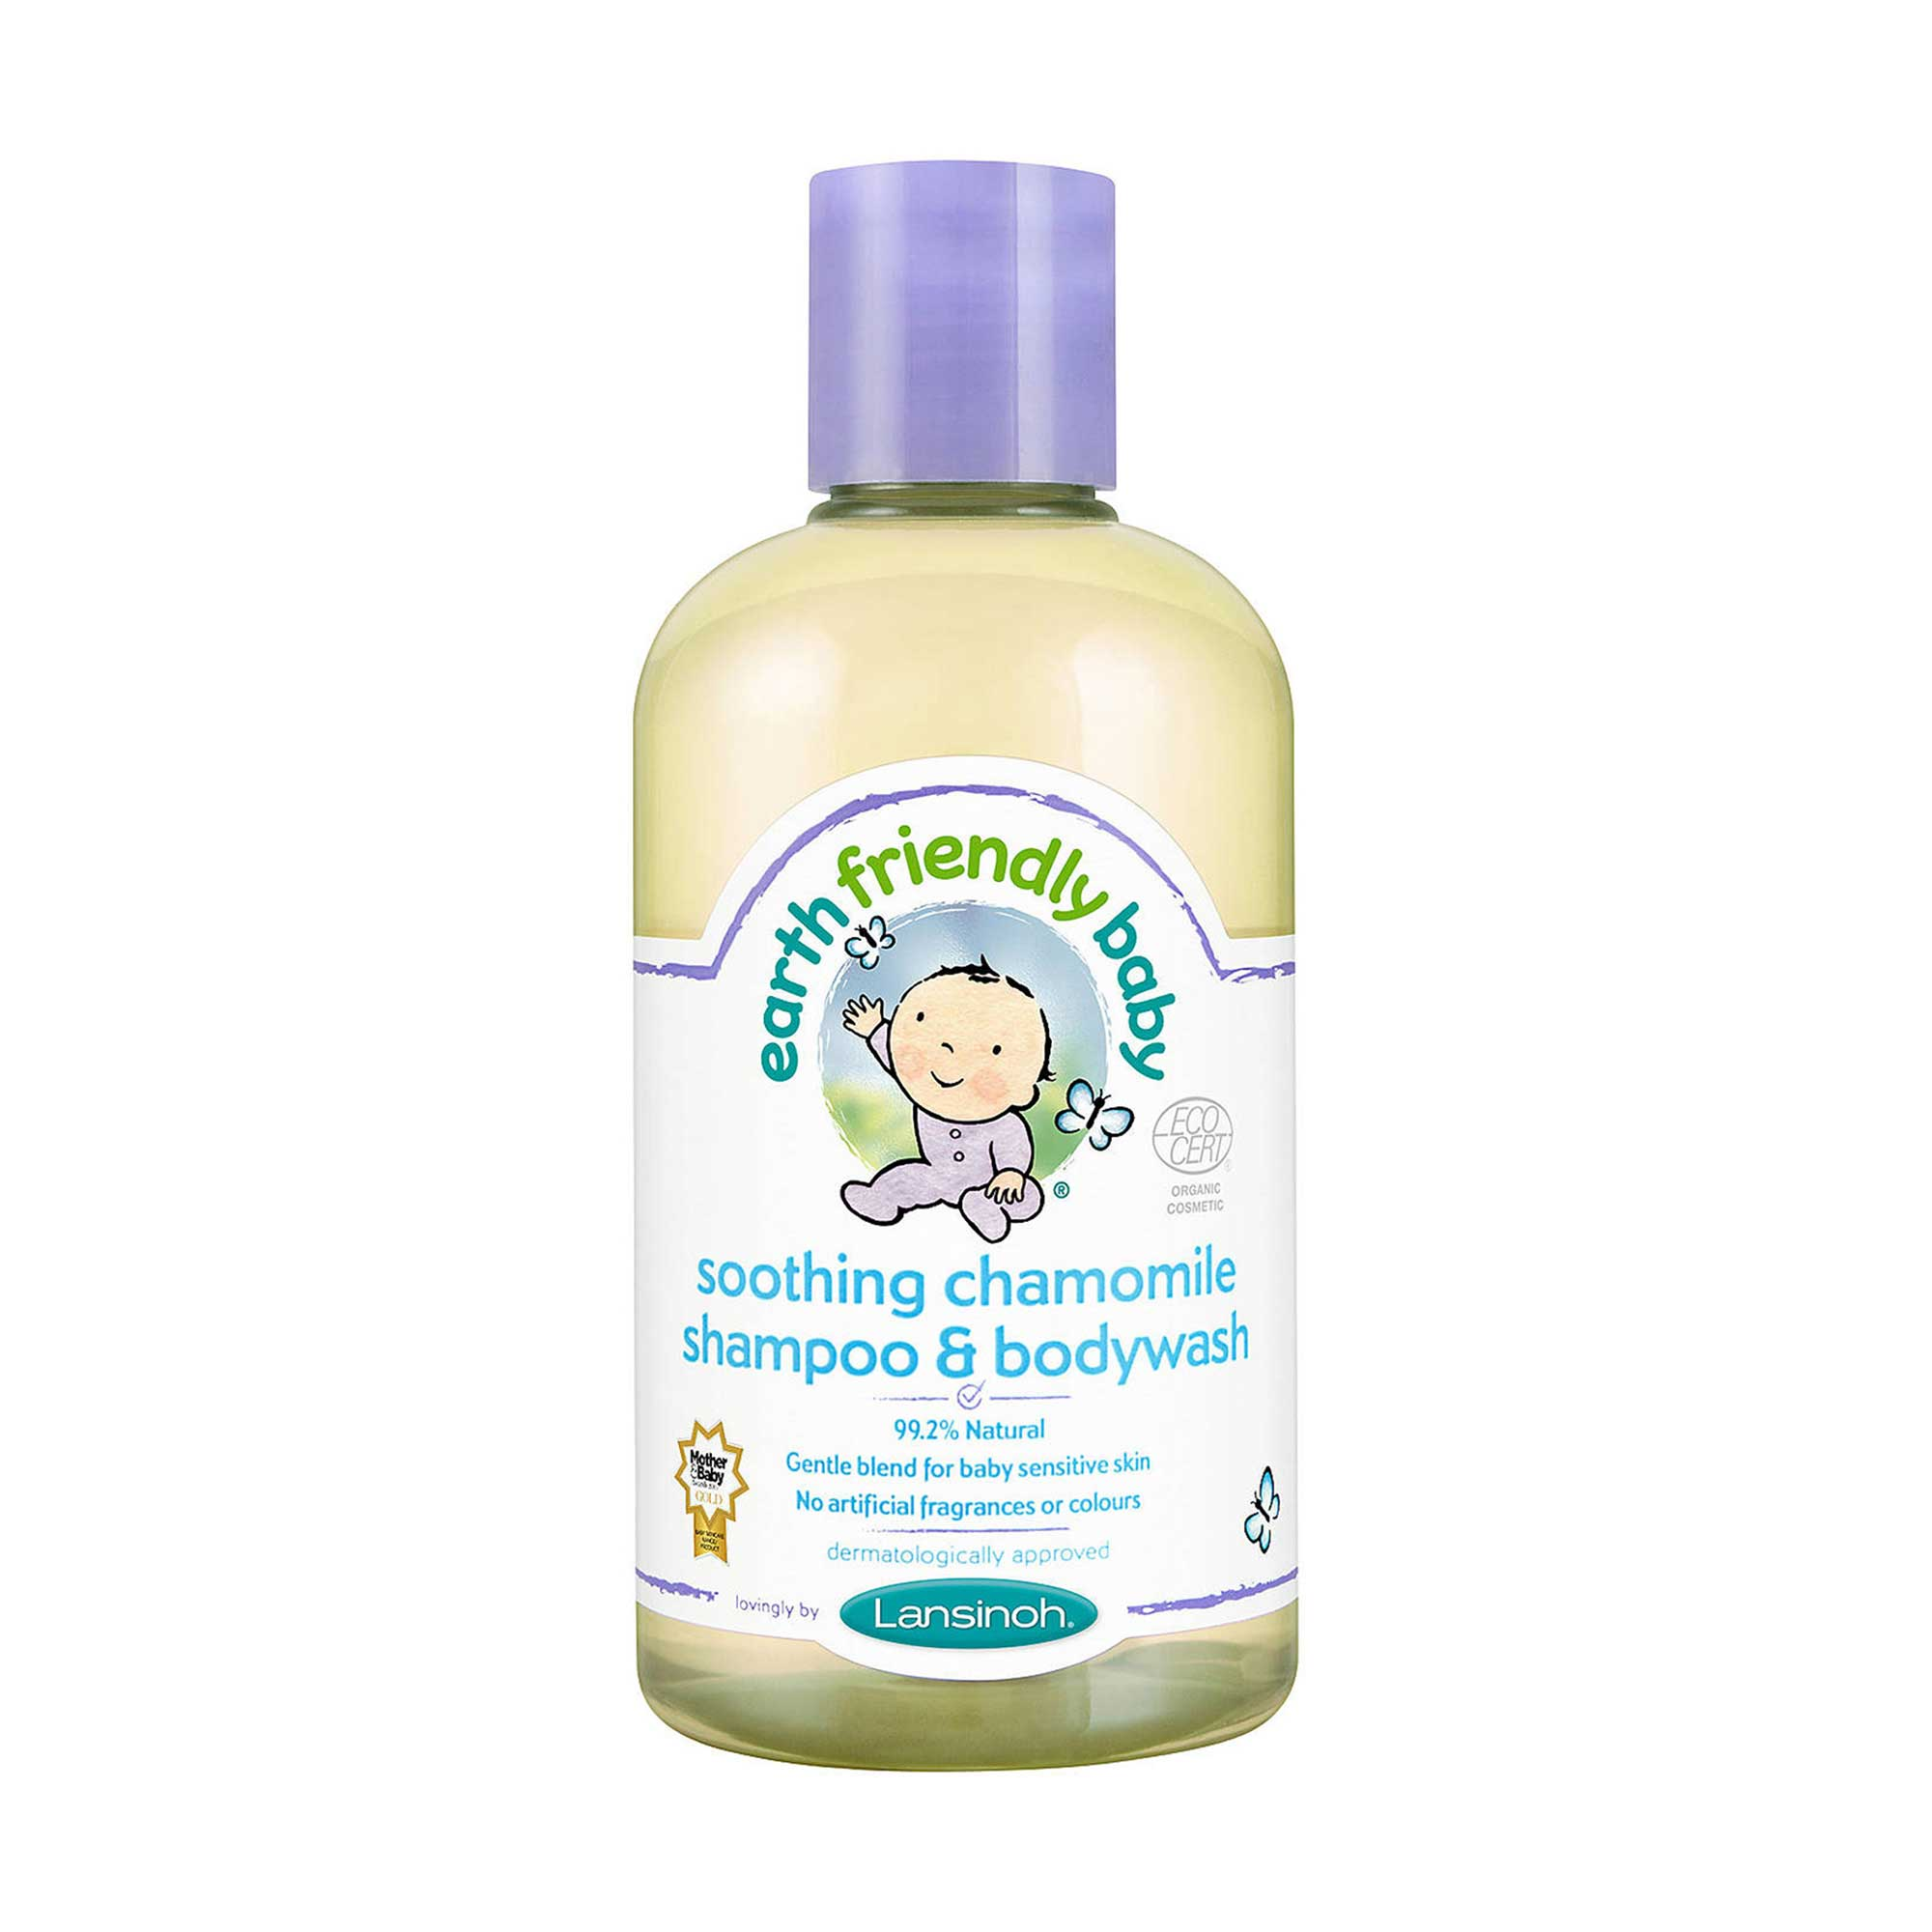 Soothing Chamomile Shampoo & Bodywash (Baby) 250ml